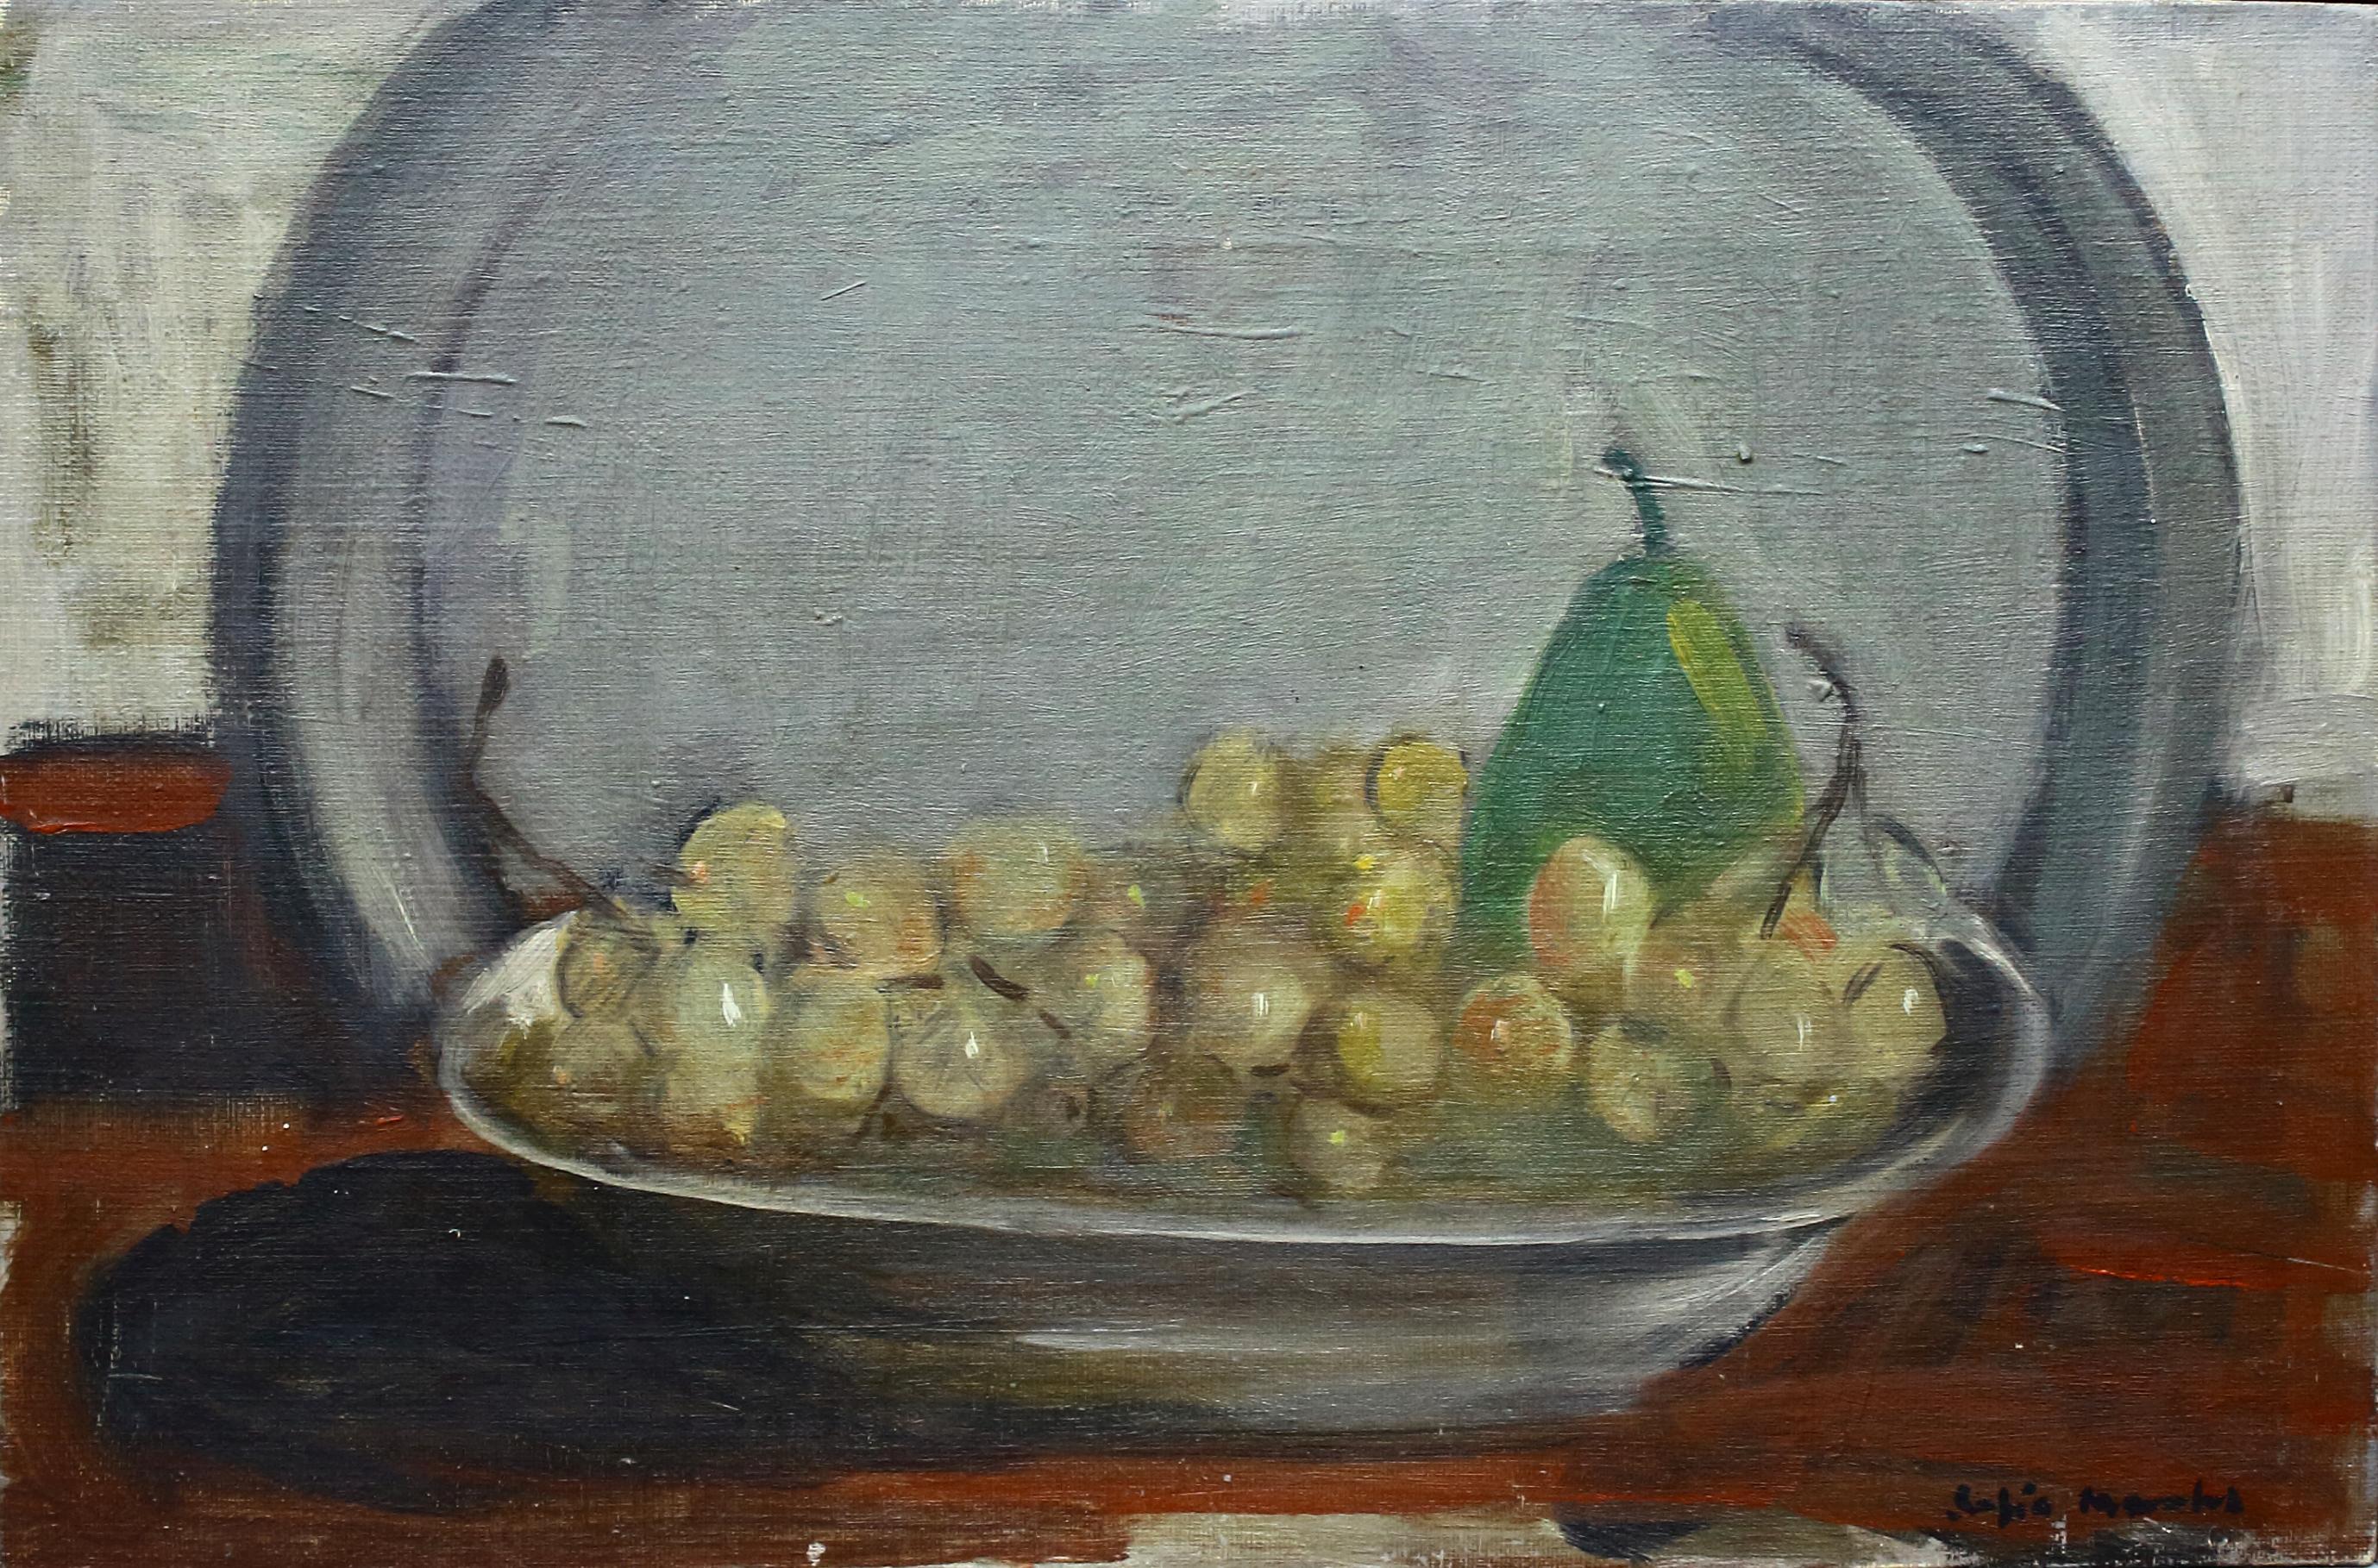 Sofia Morales (1917 – 2005). Oleo sobre lienzo. Medidas de 27 x 41